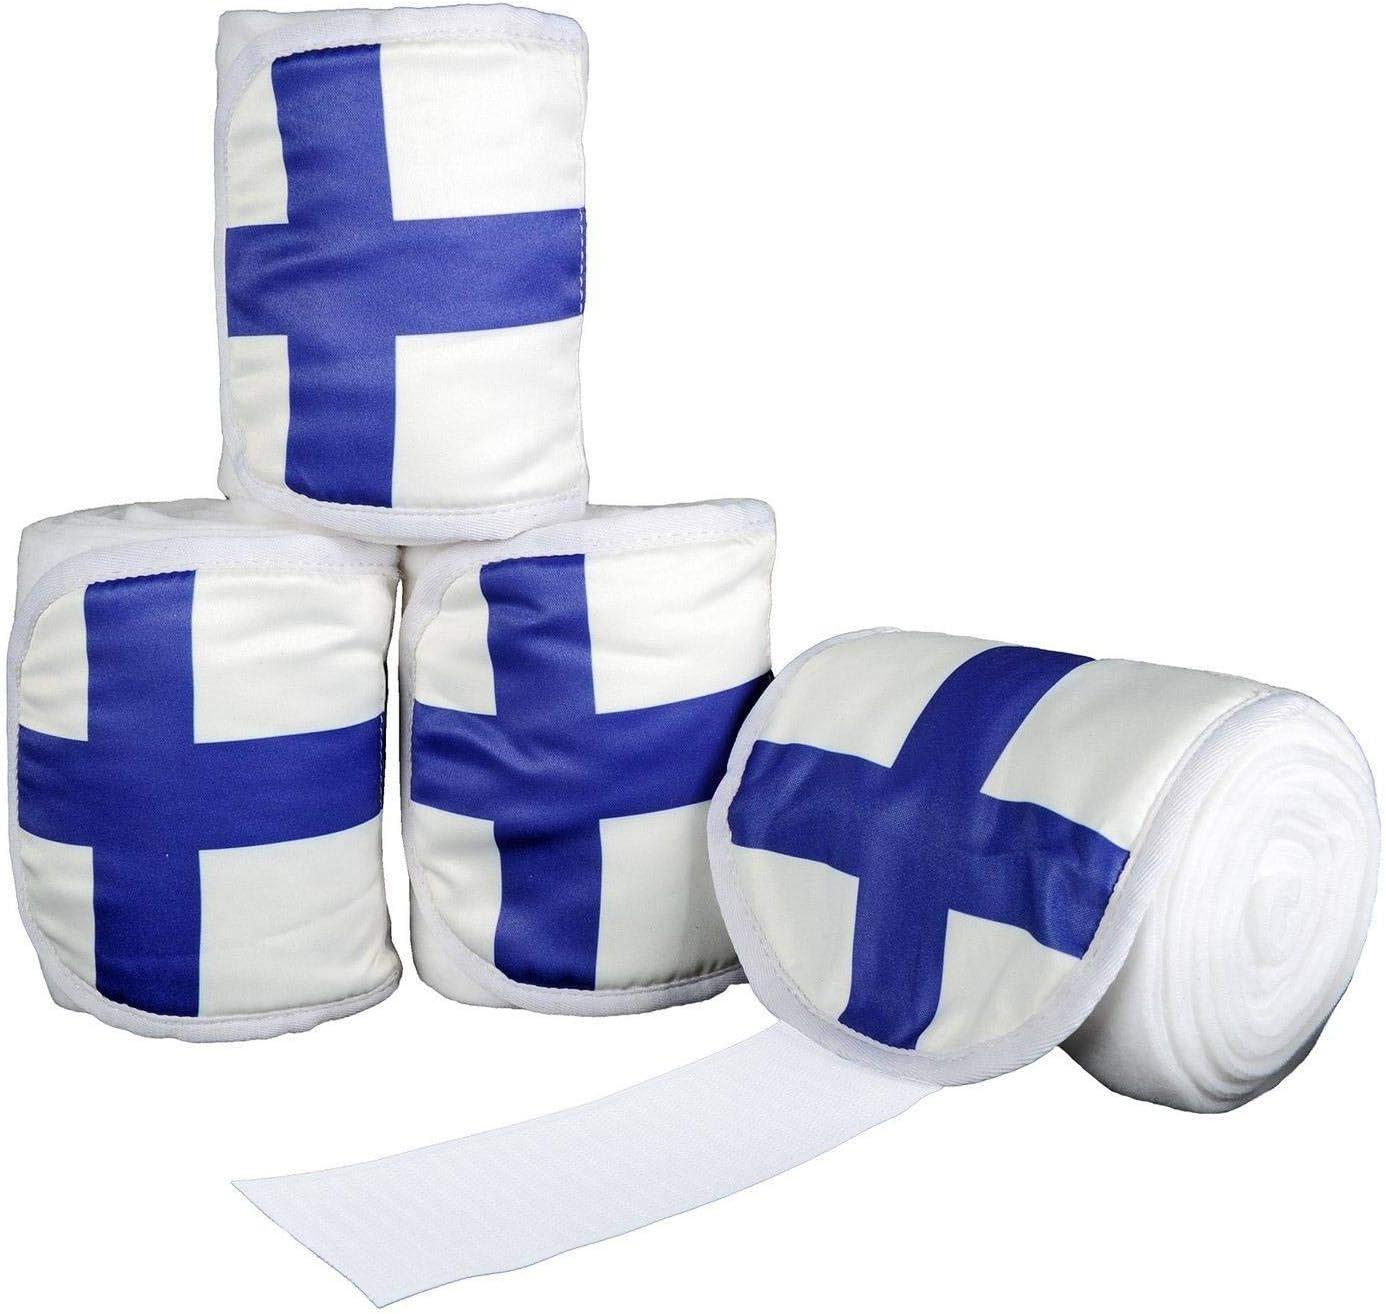 4/Unidades Hkm polarfleec Vendas Flags